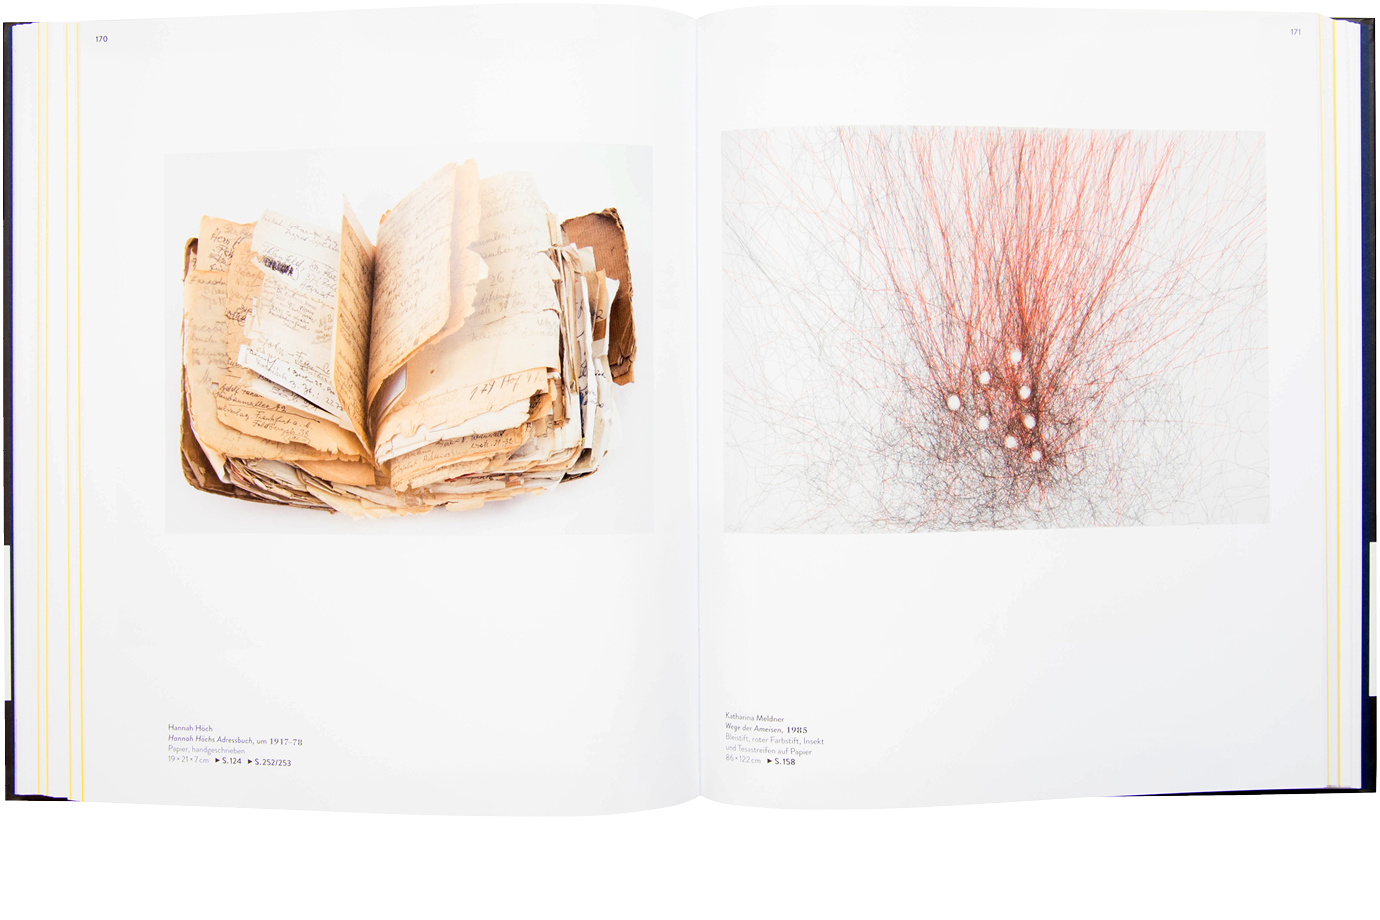 http://e-o-t.de/wordpress/wp-content/uploads/2017/06/2015_eot-BG-Jubilaeum-Book-15.jpg